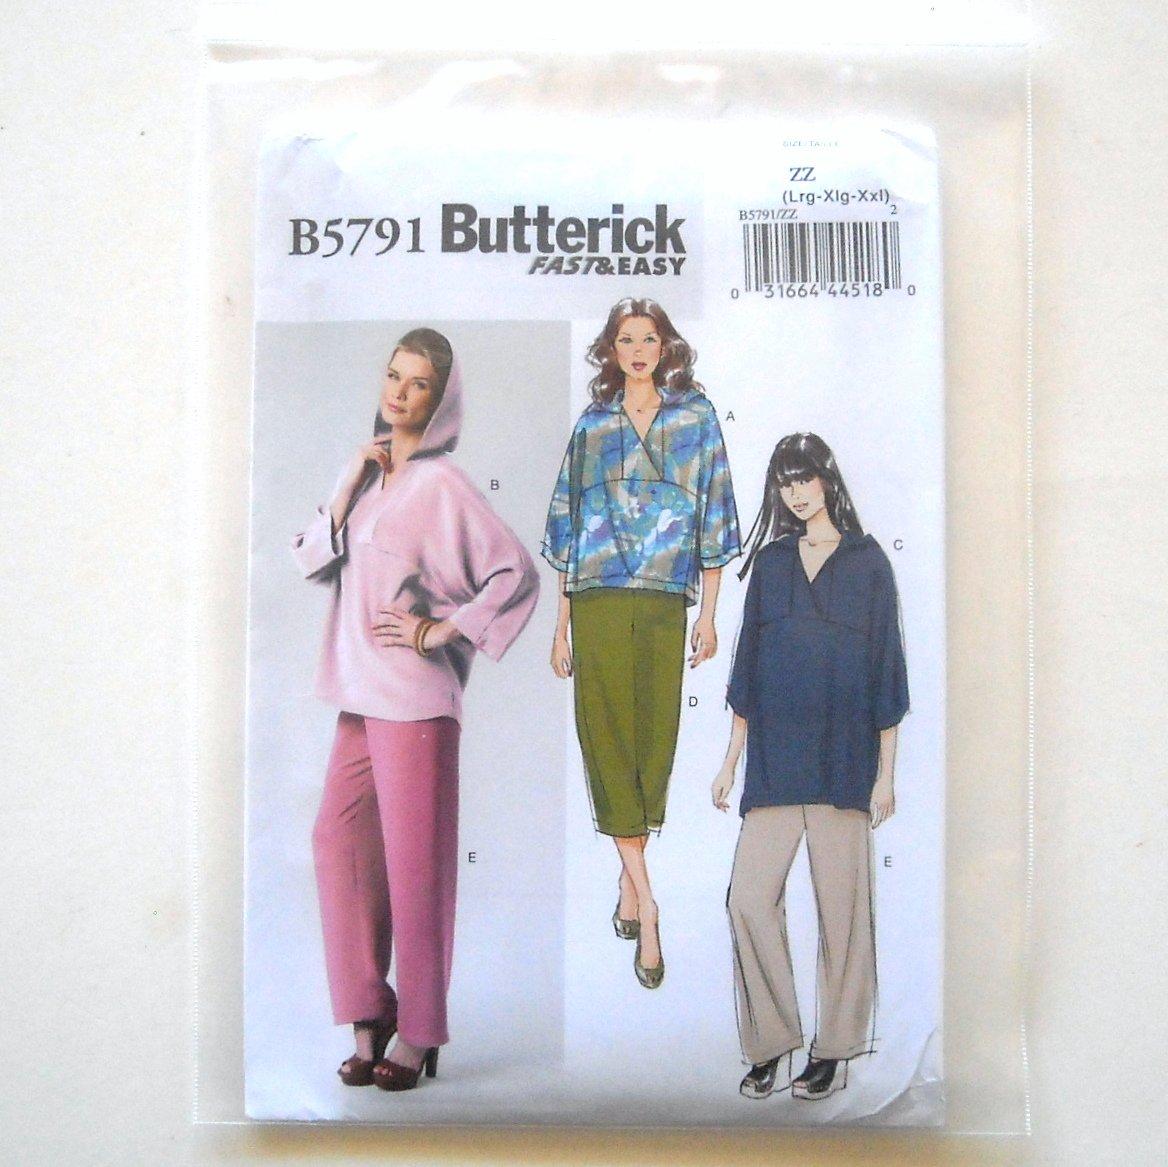 Misses' Top Tunic Pants Size L - XXL Butterick Pattern B5791